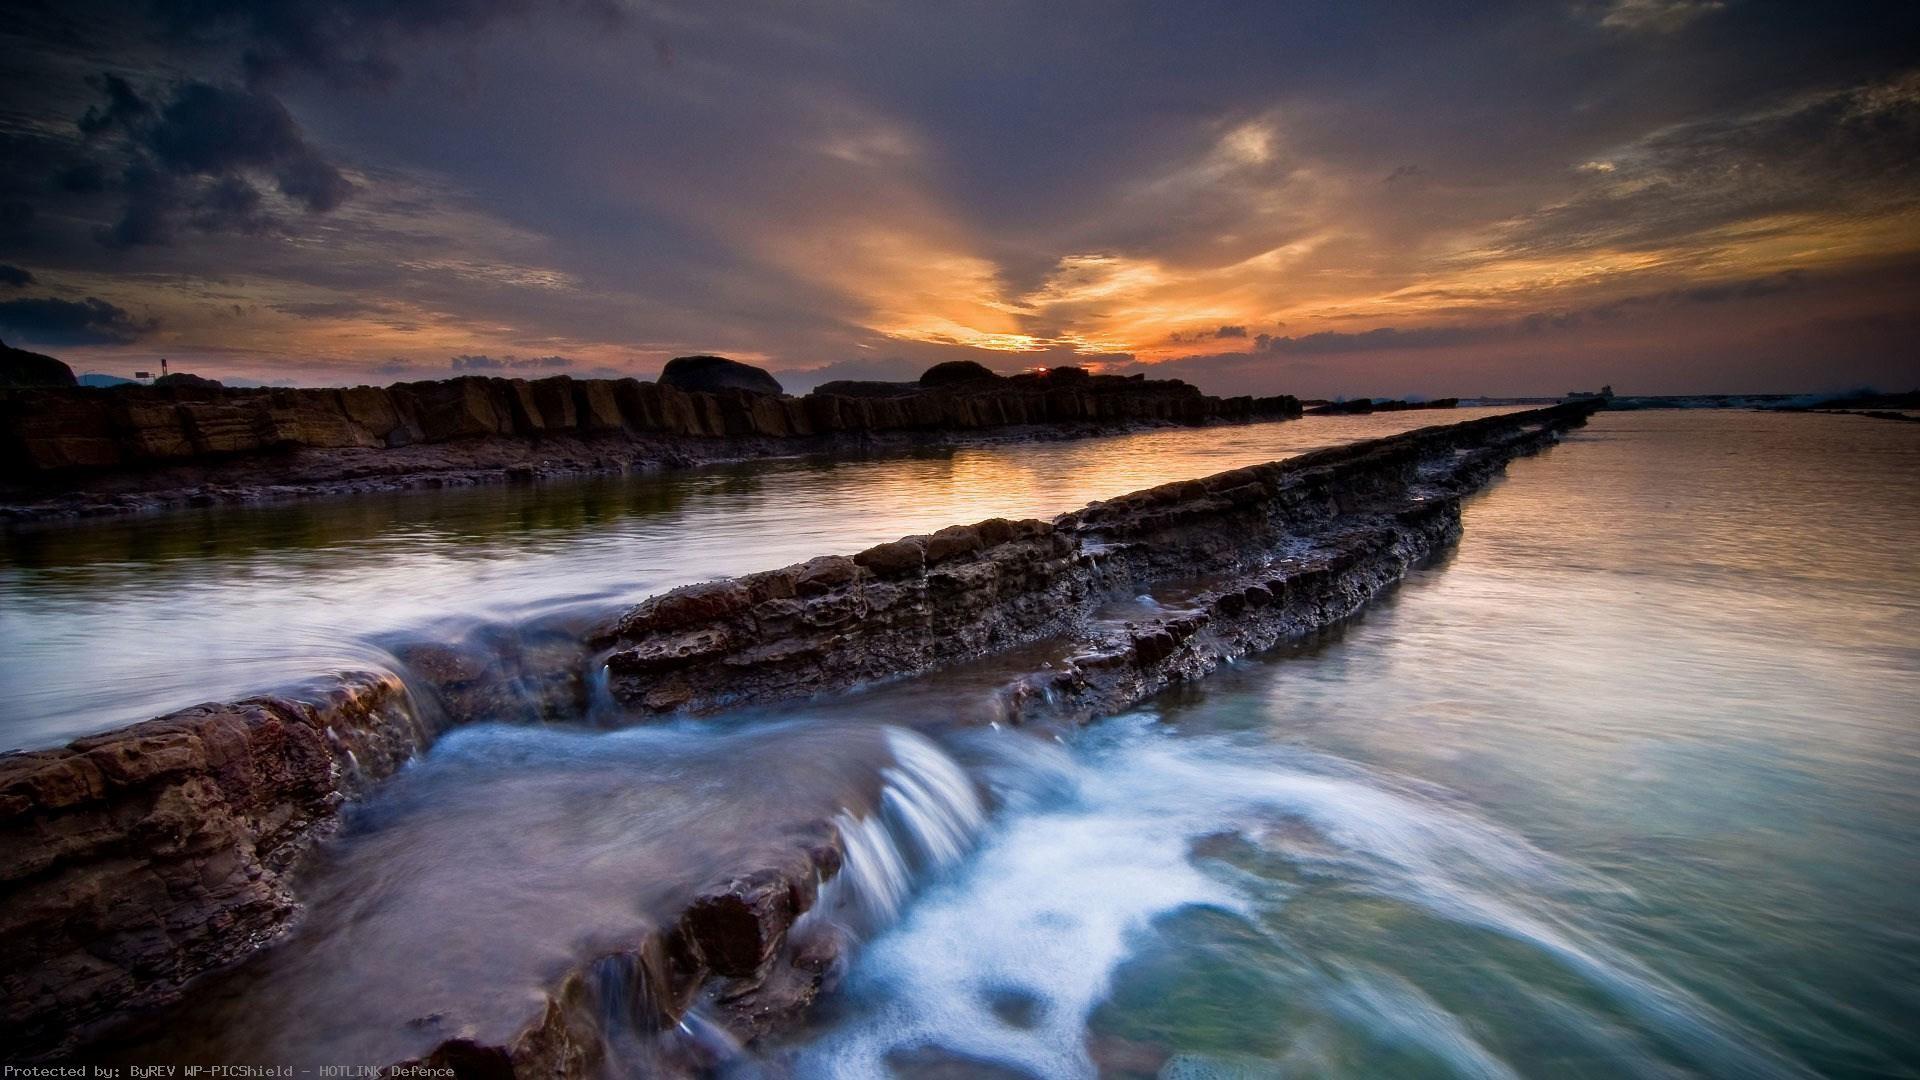 sunset-on-the-beach-hd-1080p-wallpaper-wp80012540